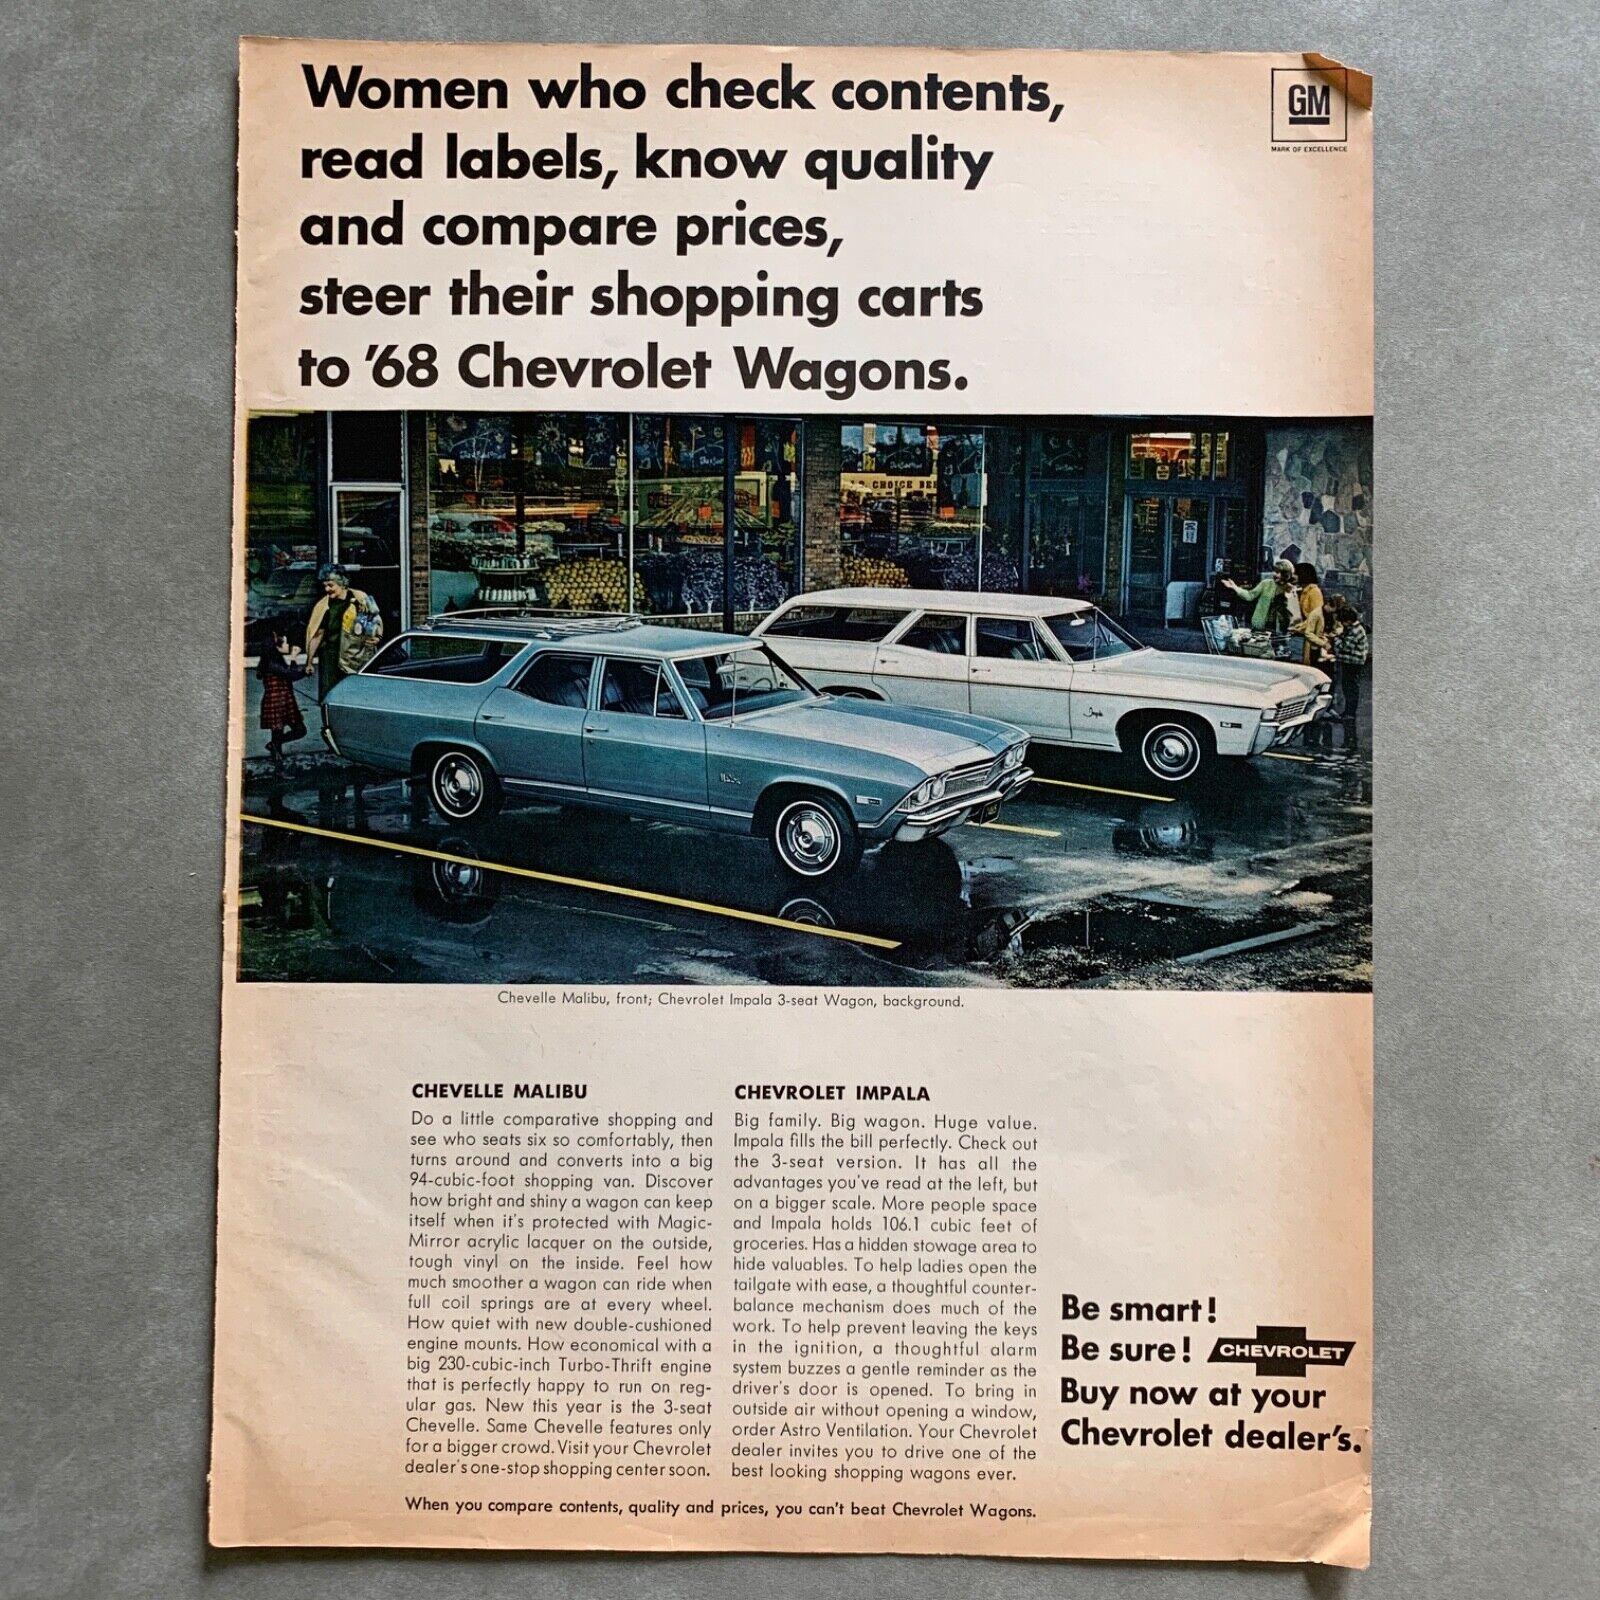 1968 Chevrolet Caprice Impala Bel Air Chevelle Malibu FL Station Wagon Brochure